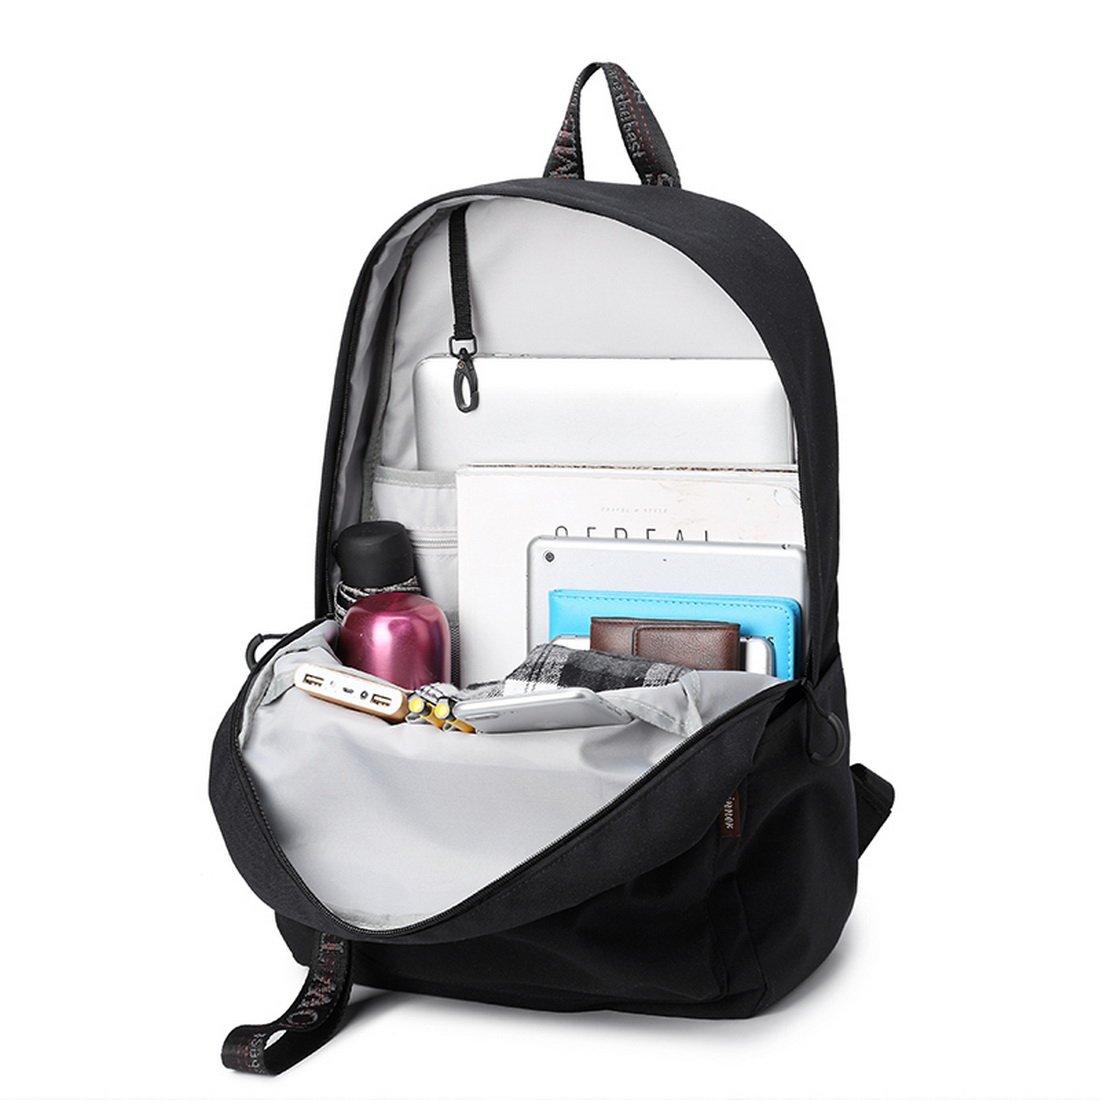 Amazon.com: Joymoze Unisex Fashion School Bag Teen Laptop Backpack with USB Charging Port Pink: Computers & Accessories